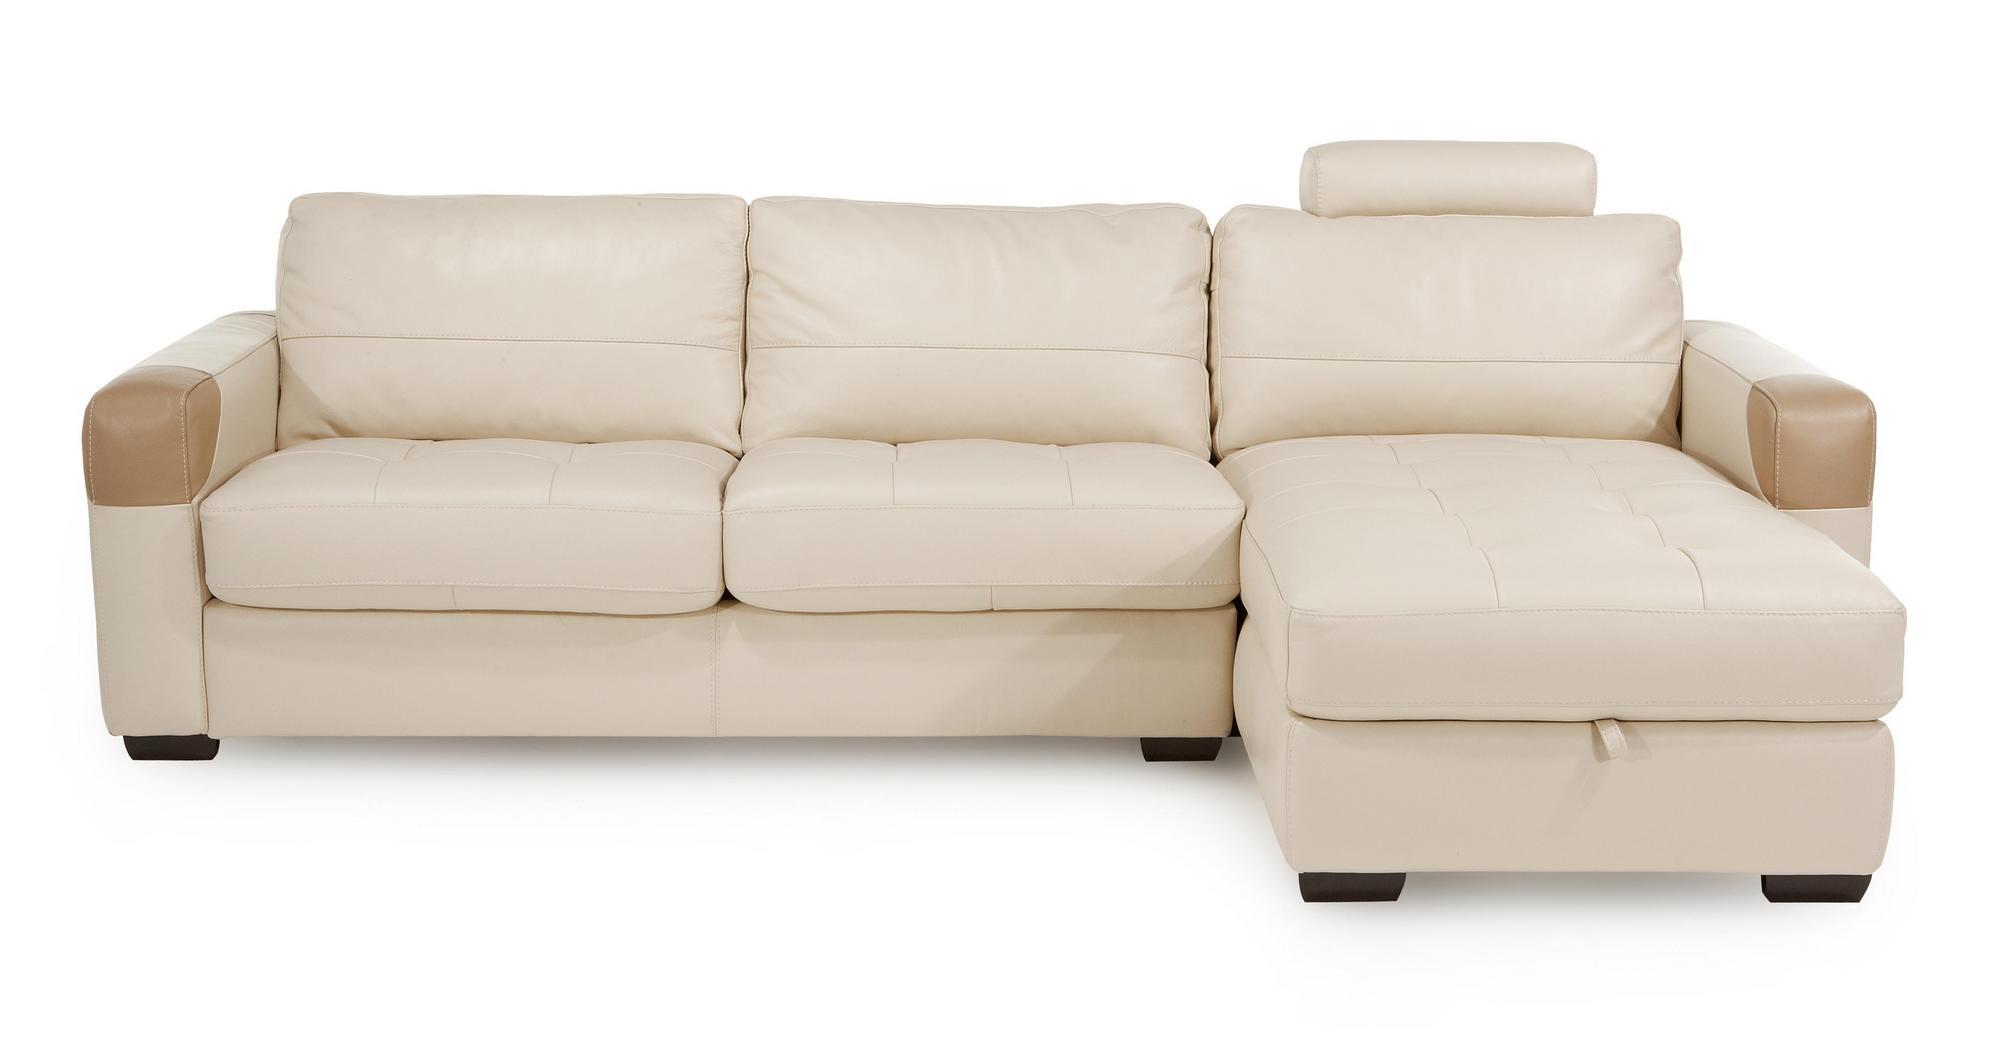 DFS Action Leather Large Storage Corner Sofa & Headrest